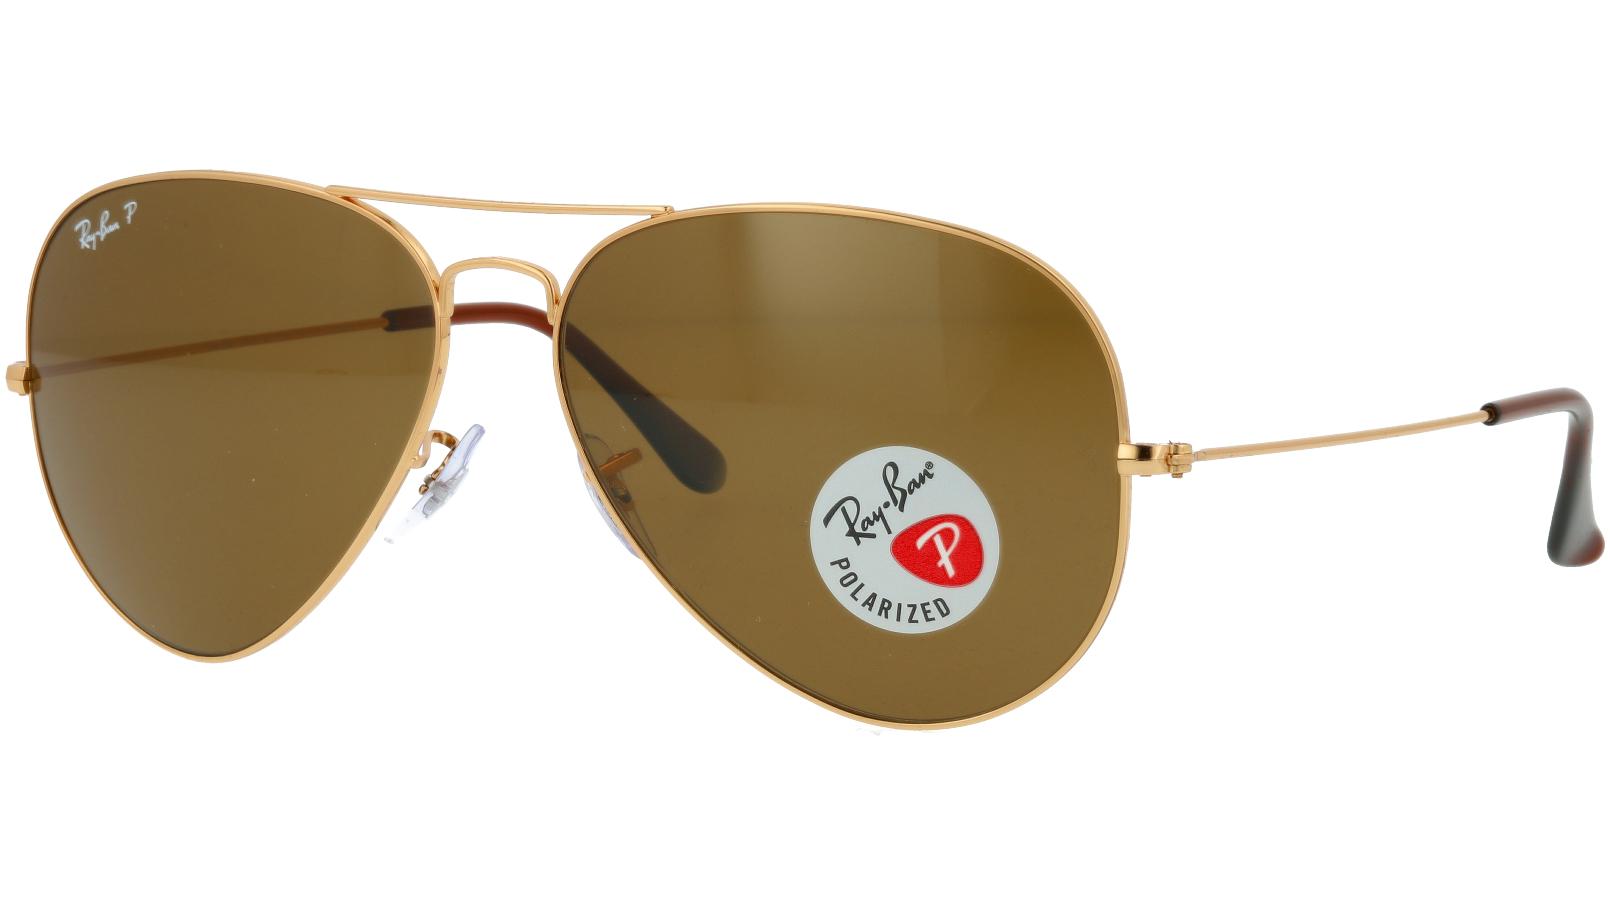 Ray-Ban RB3025 001/57 62 Arista Polarized Sunglasses